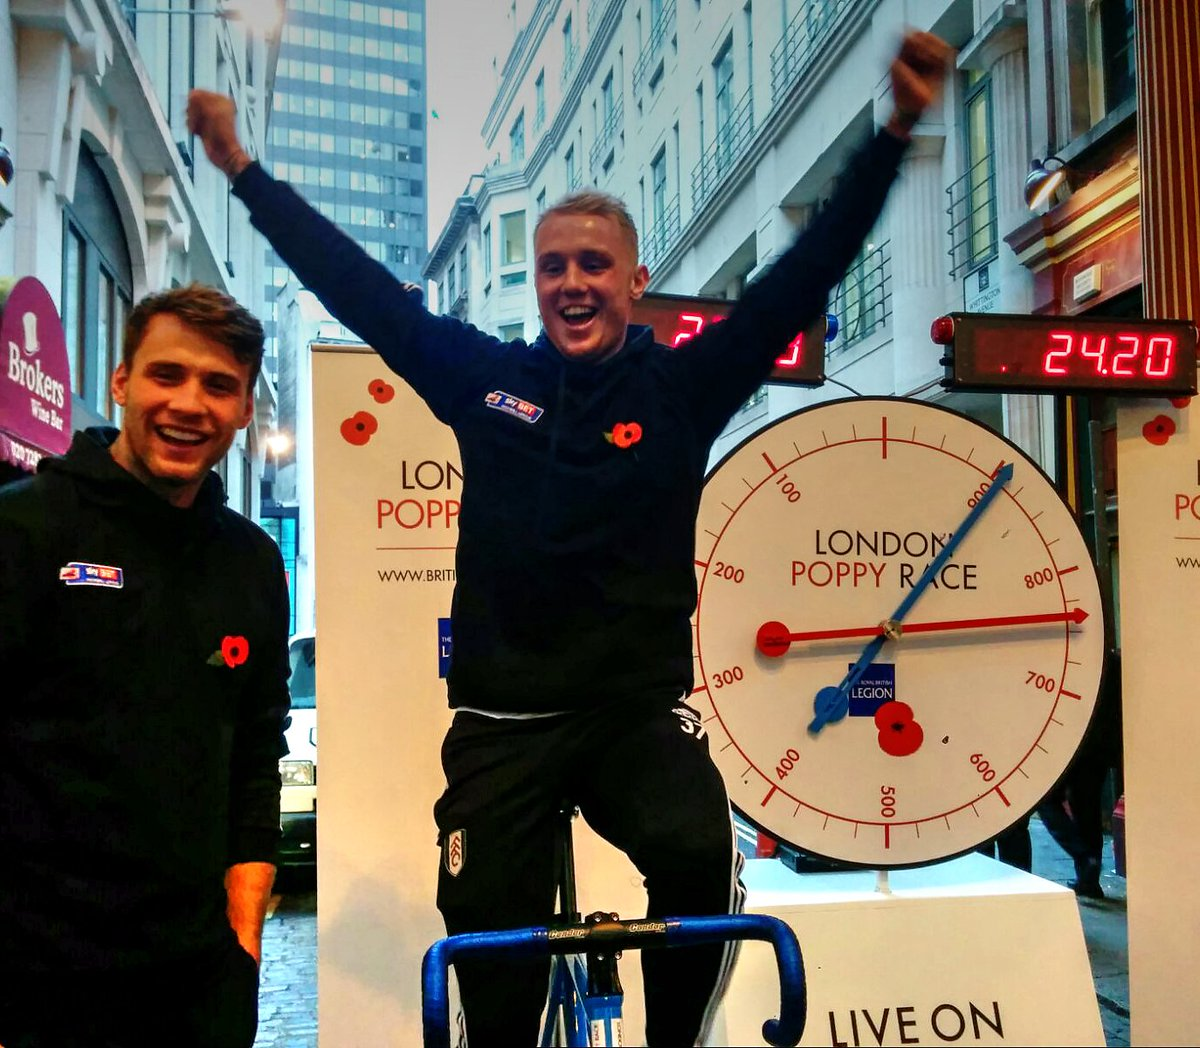 Fulham FC players get involved. London Poppy Race, challenge them until 7! Leadenhall Mkt #LDNPoppyday @PoppyLegion https://t.co/2P9nWKPaf5